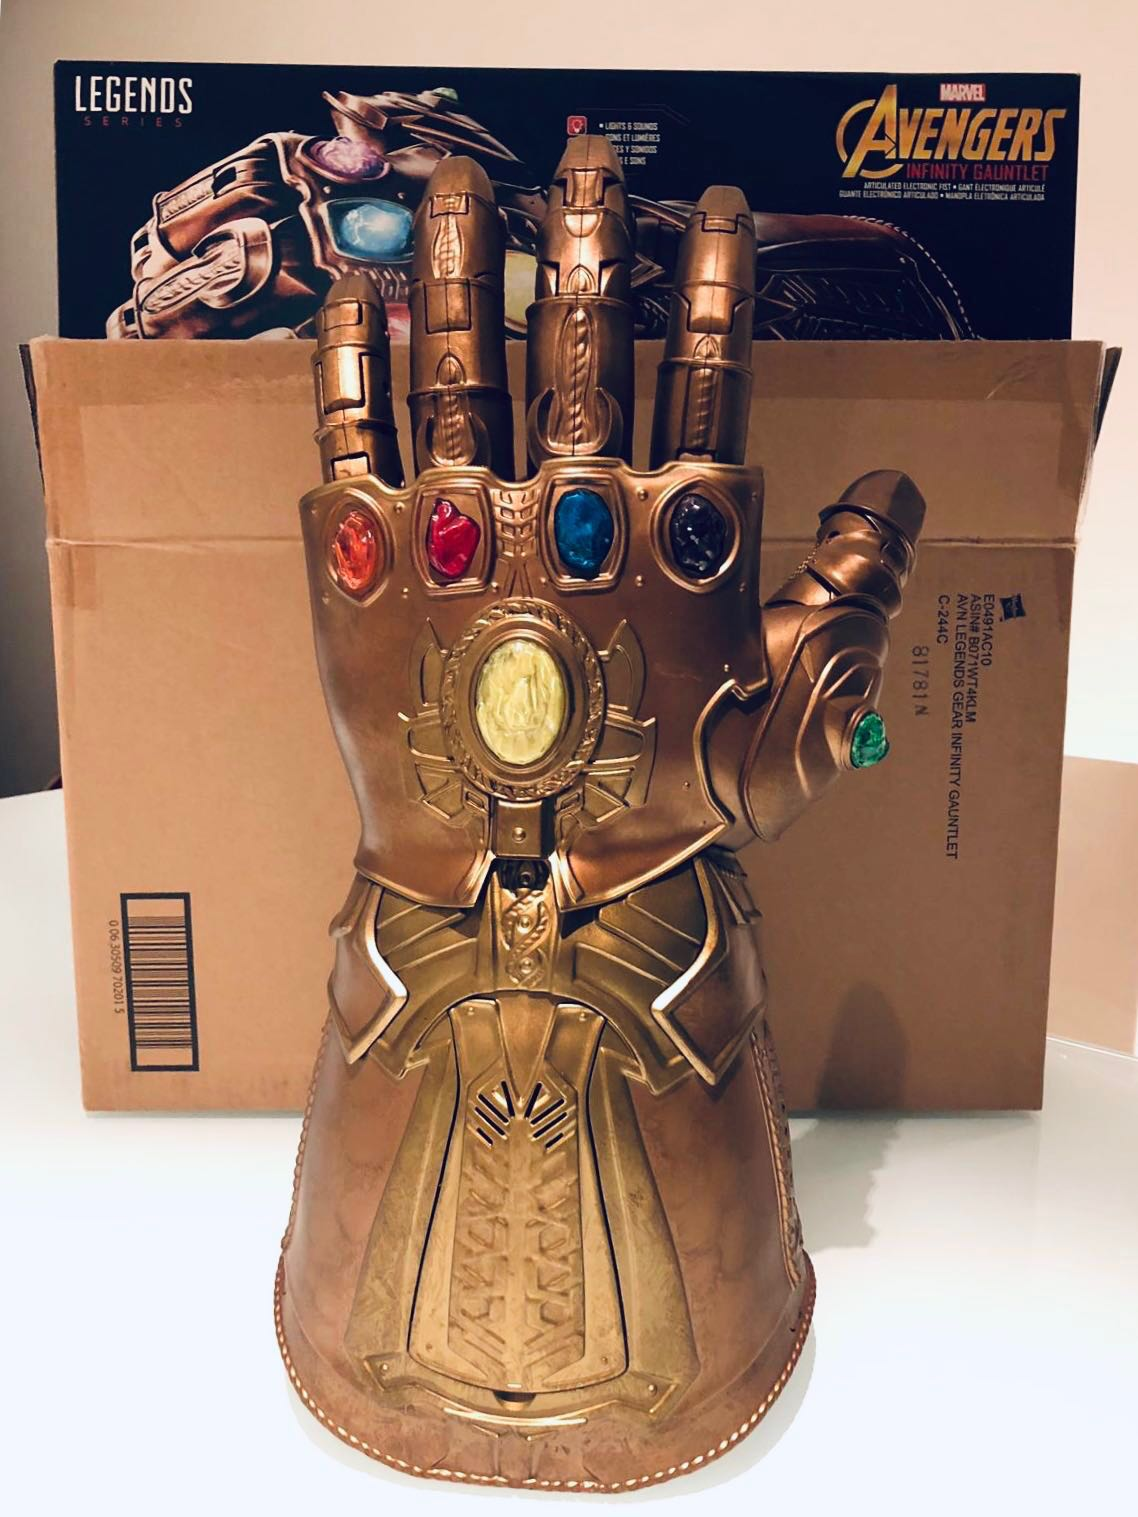 BEST DEAL! Avengers Infinity Gauntlet Electronic Fist